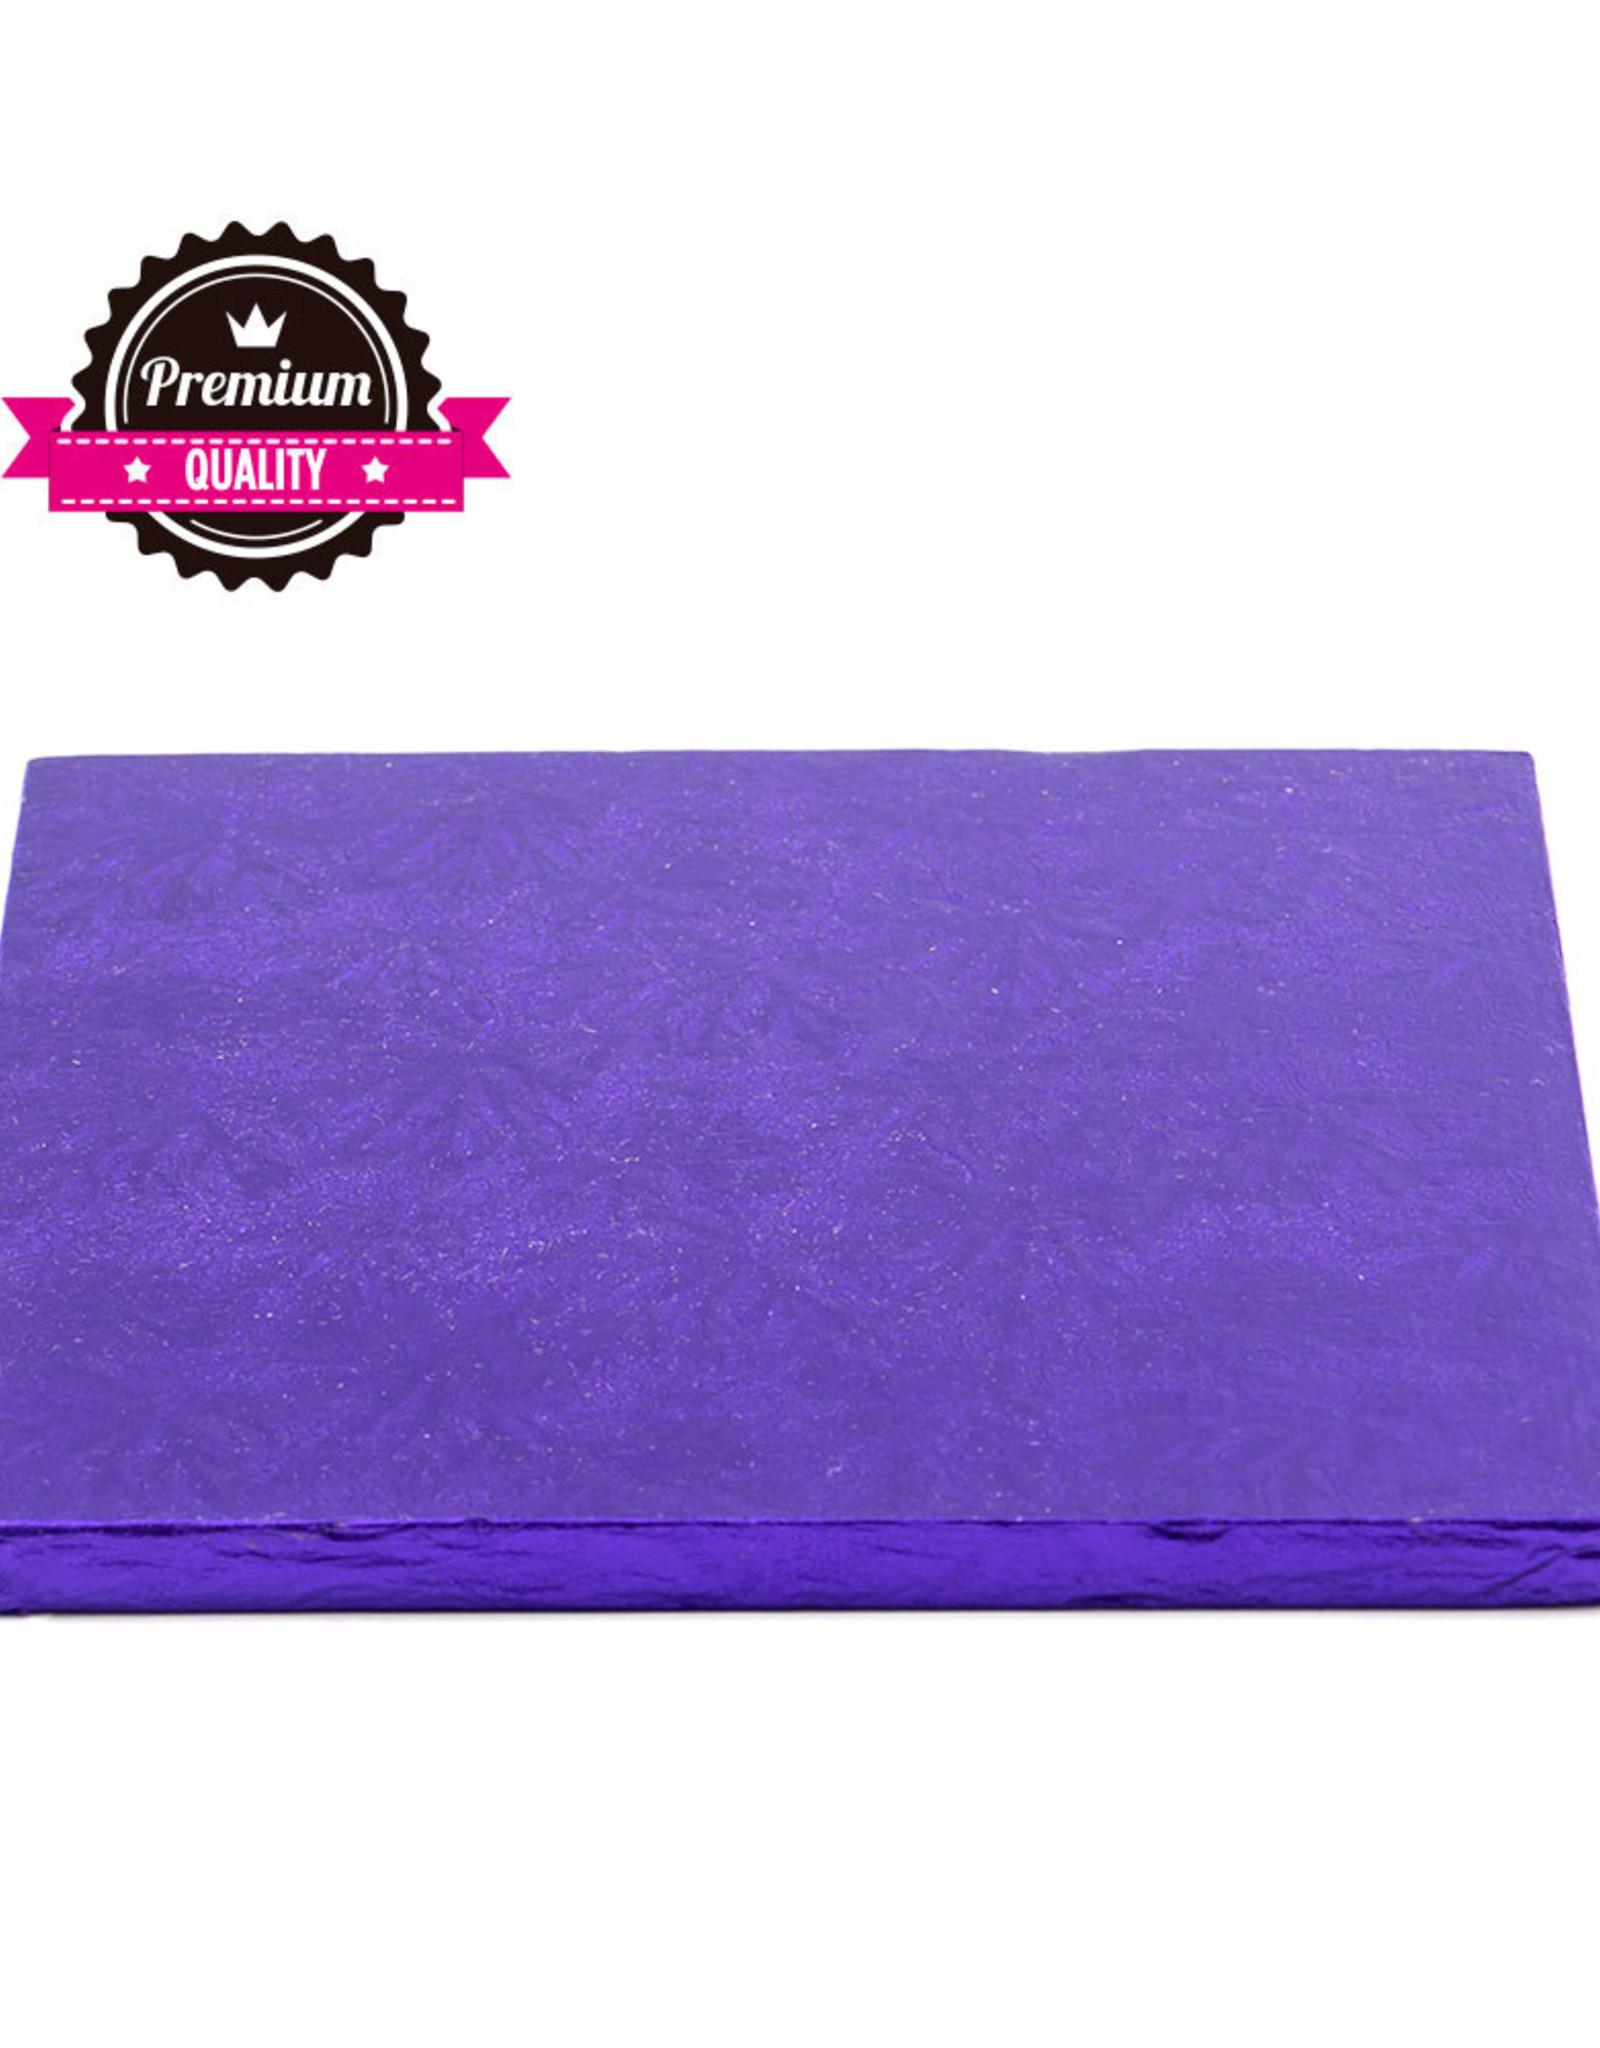 Decora Cake Drum Vierkant 35cm Violet